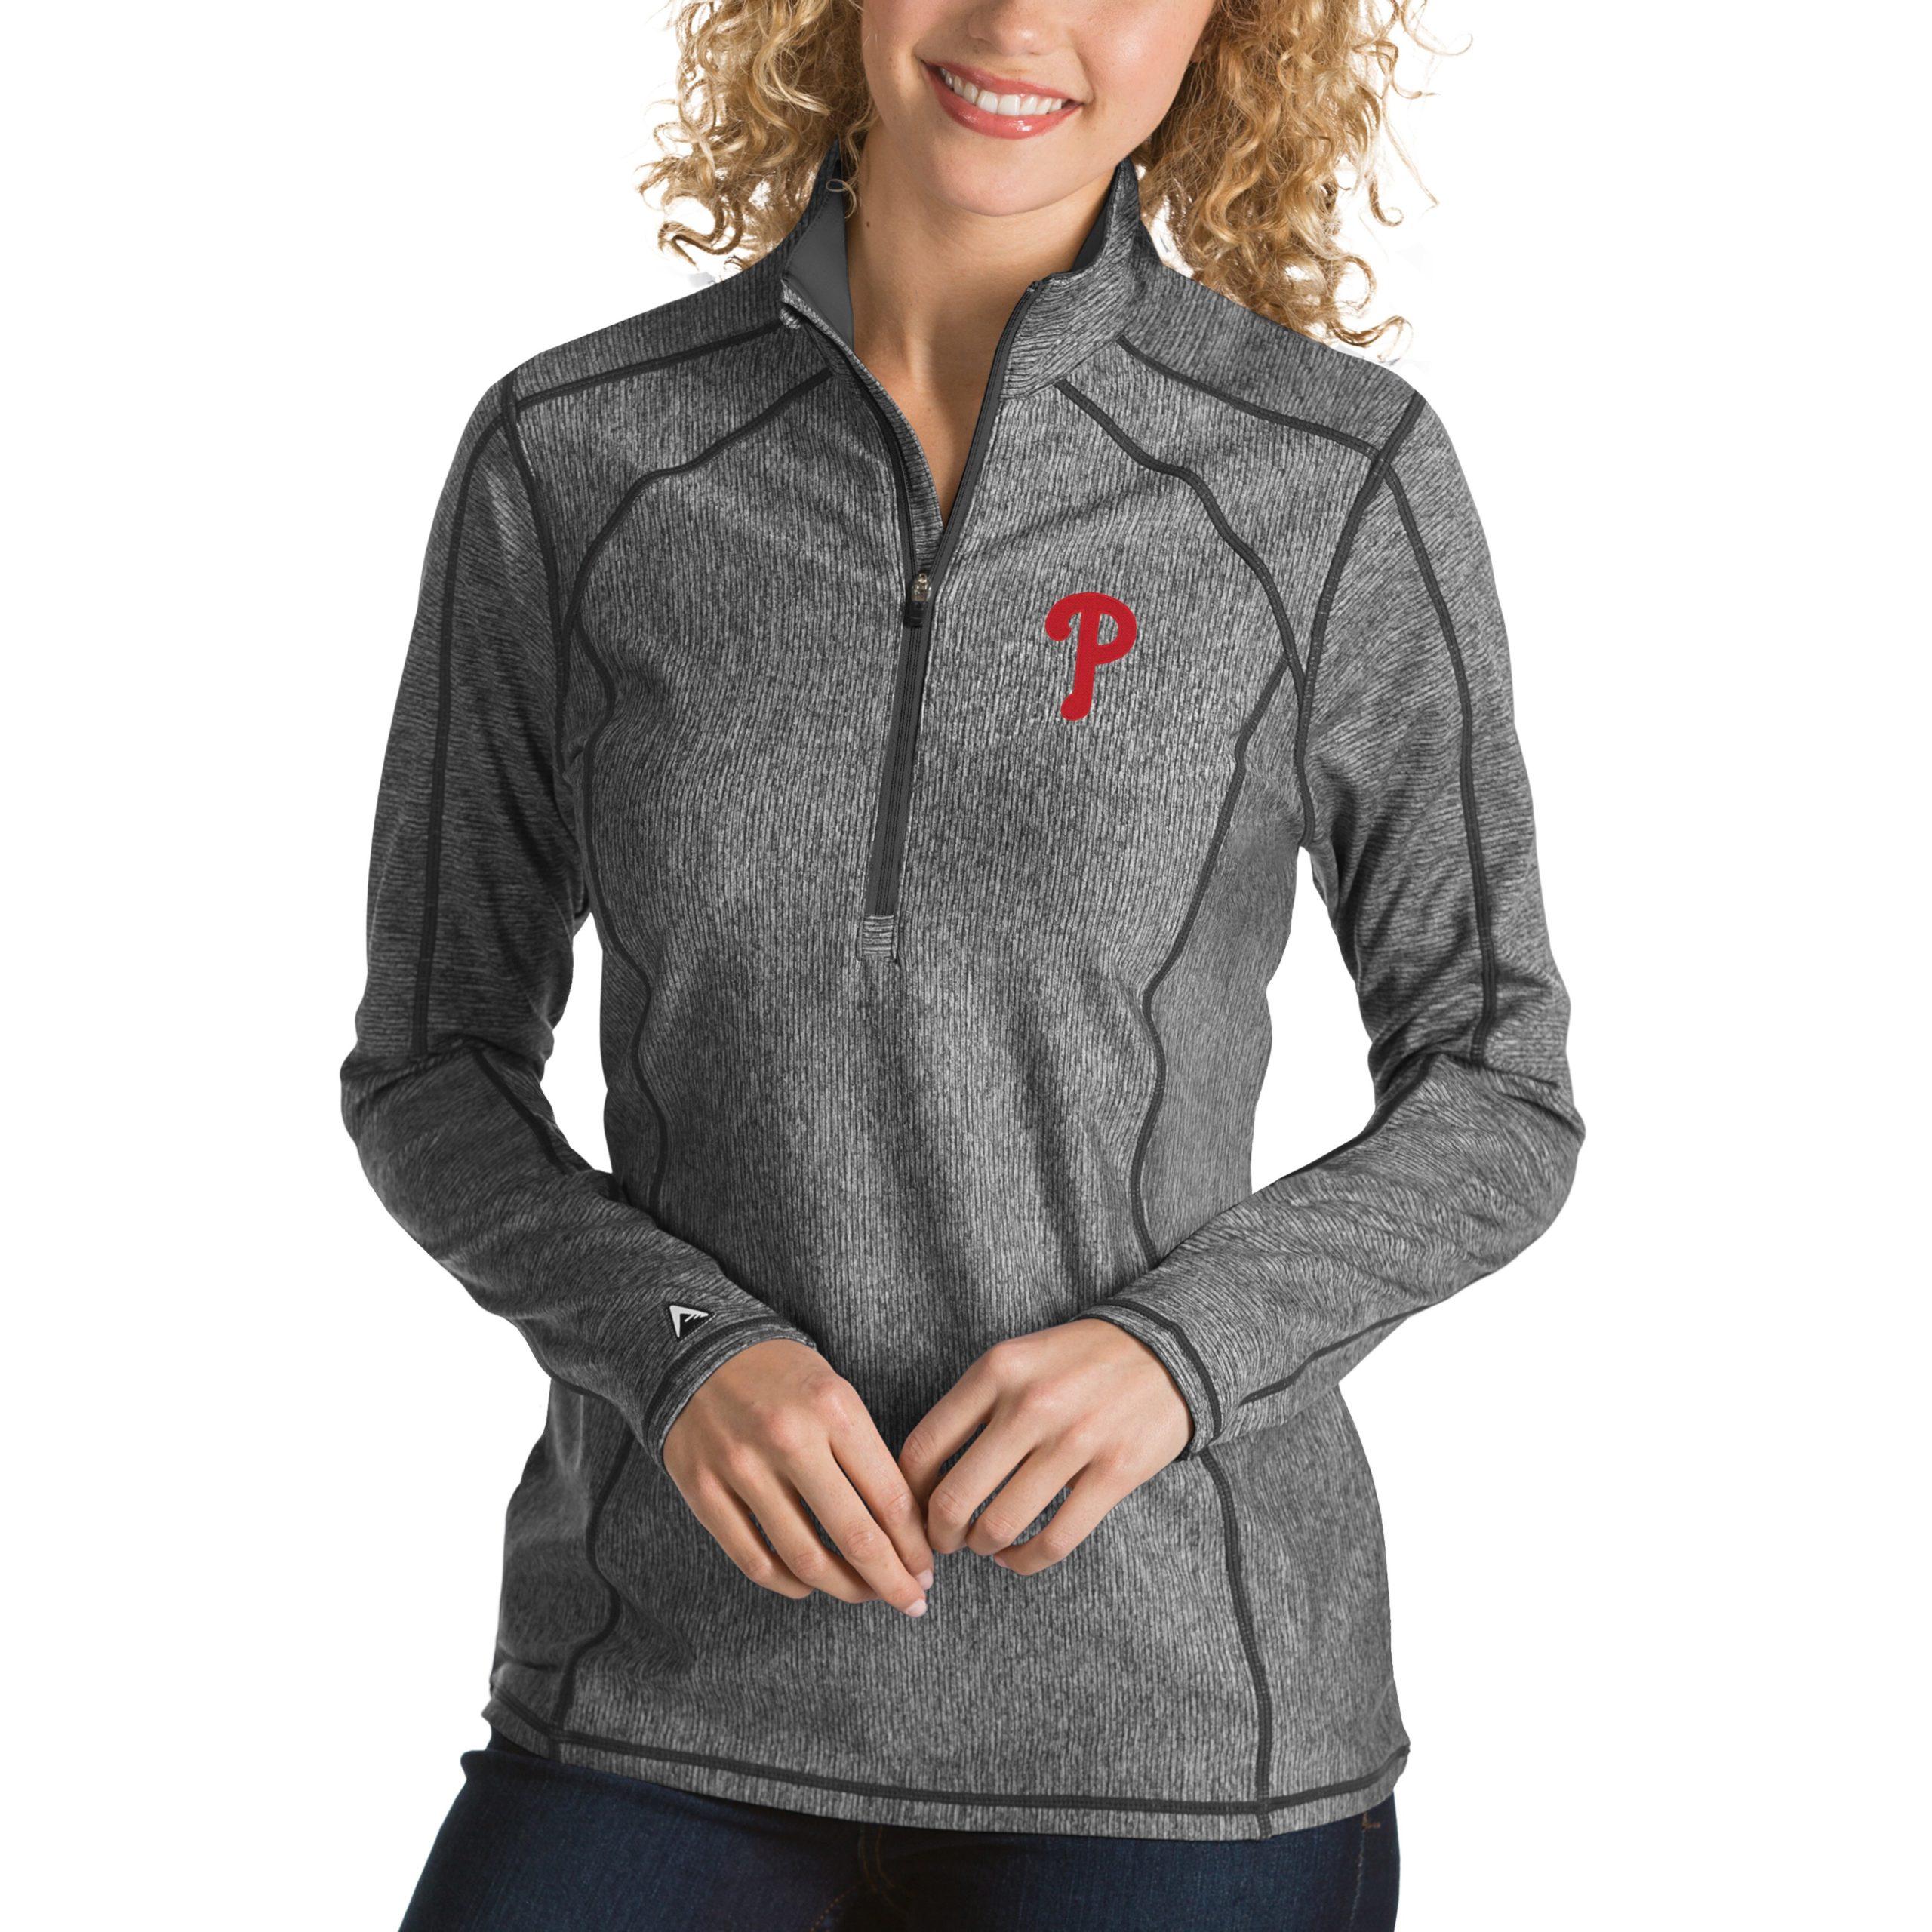 Philadelphia Phillies Antigua Women's Tempo Desert Dry 1/4-Zip Pullover Jacket - Heathered Charcoal